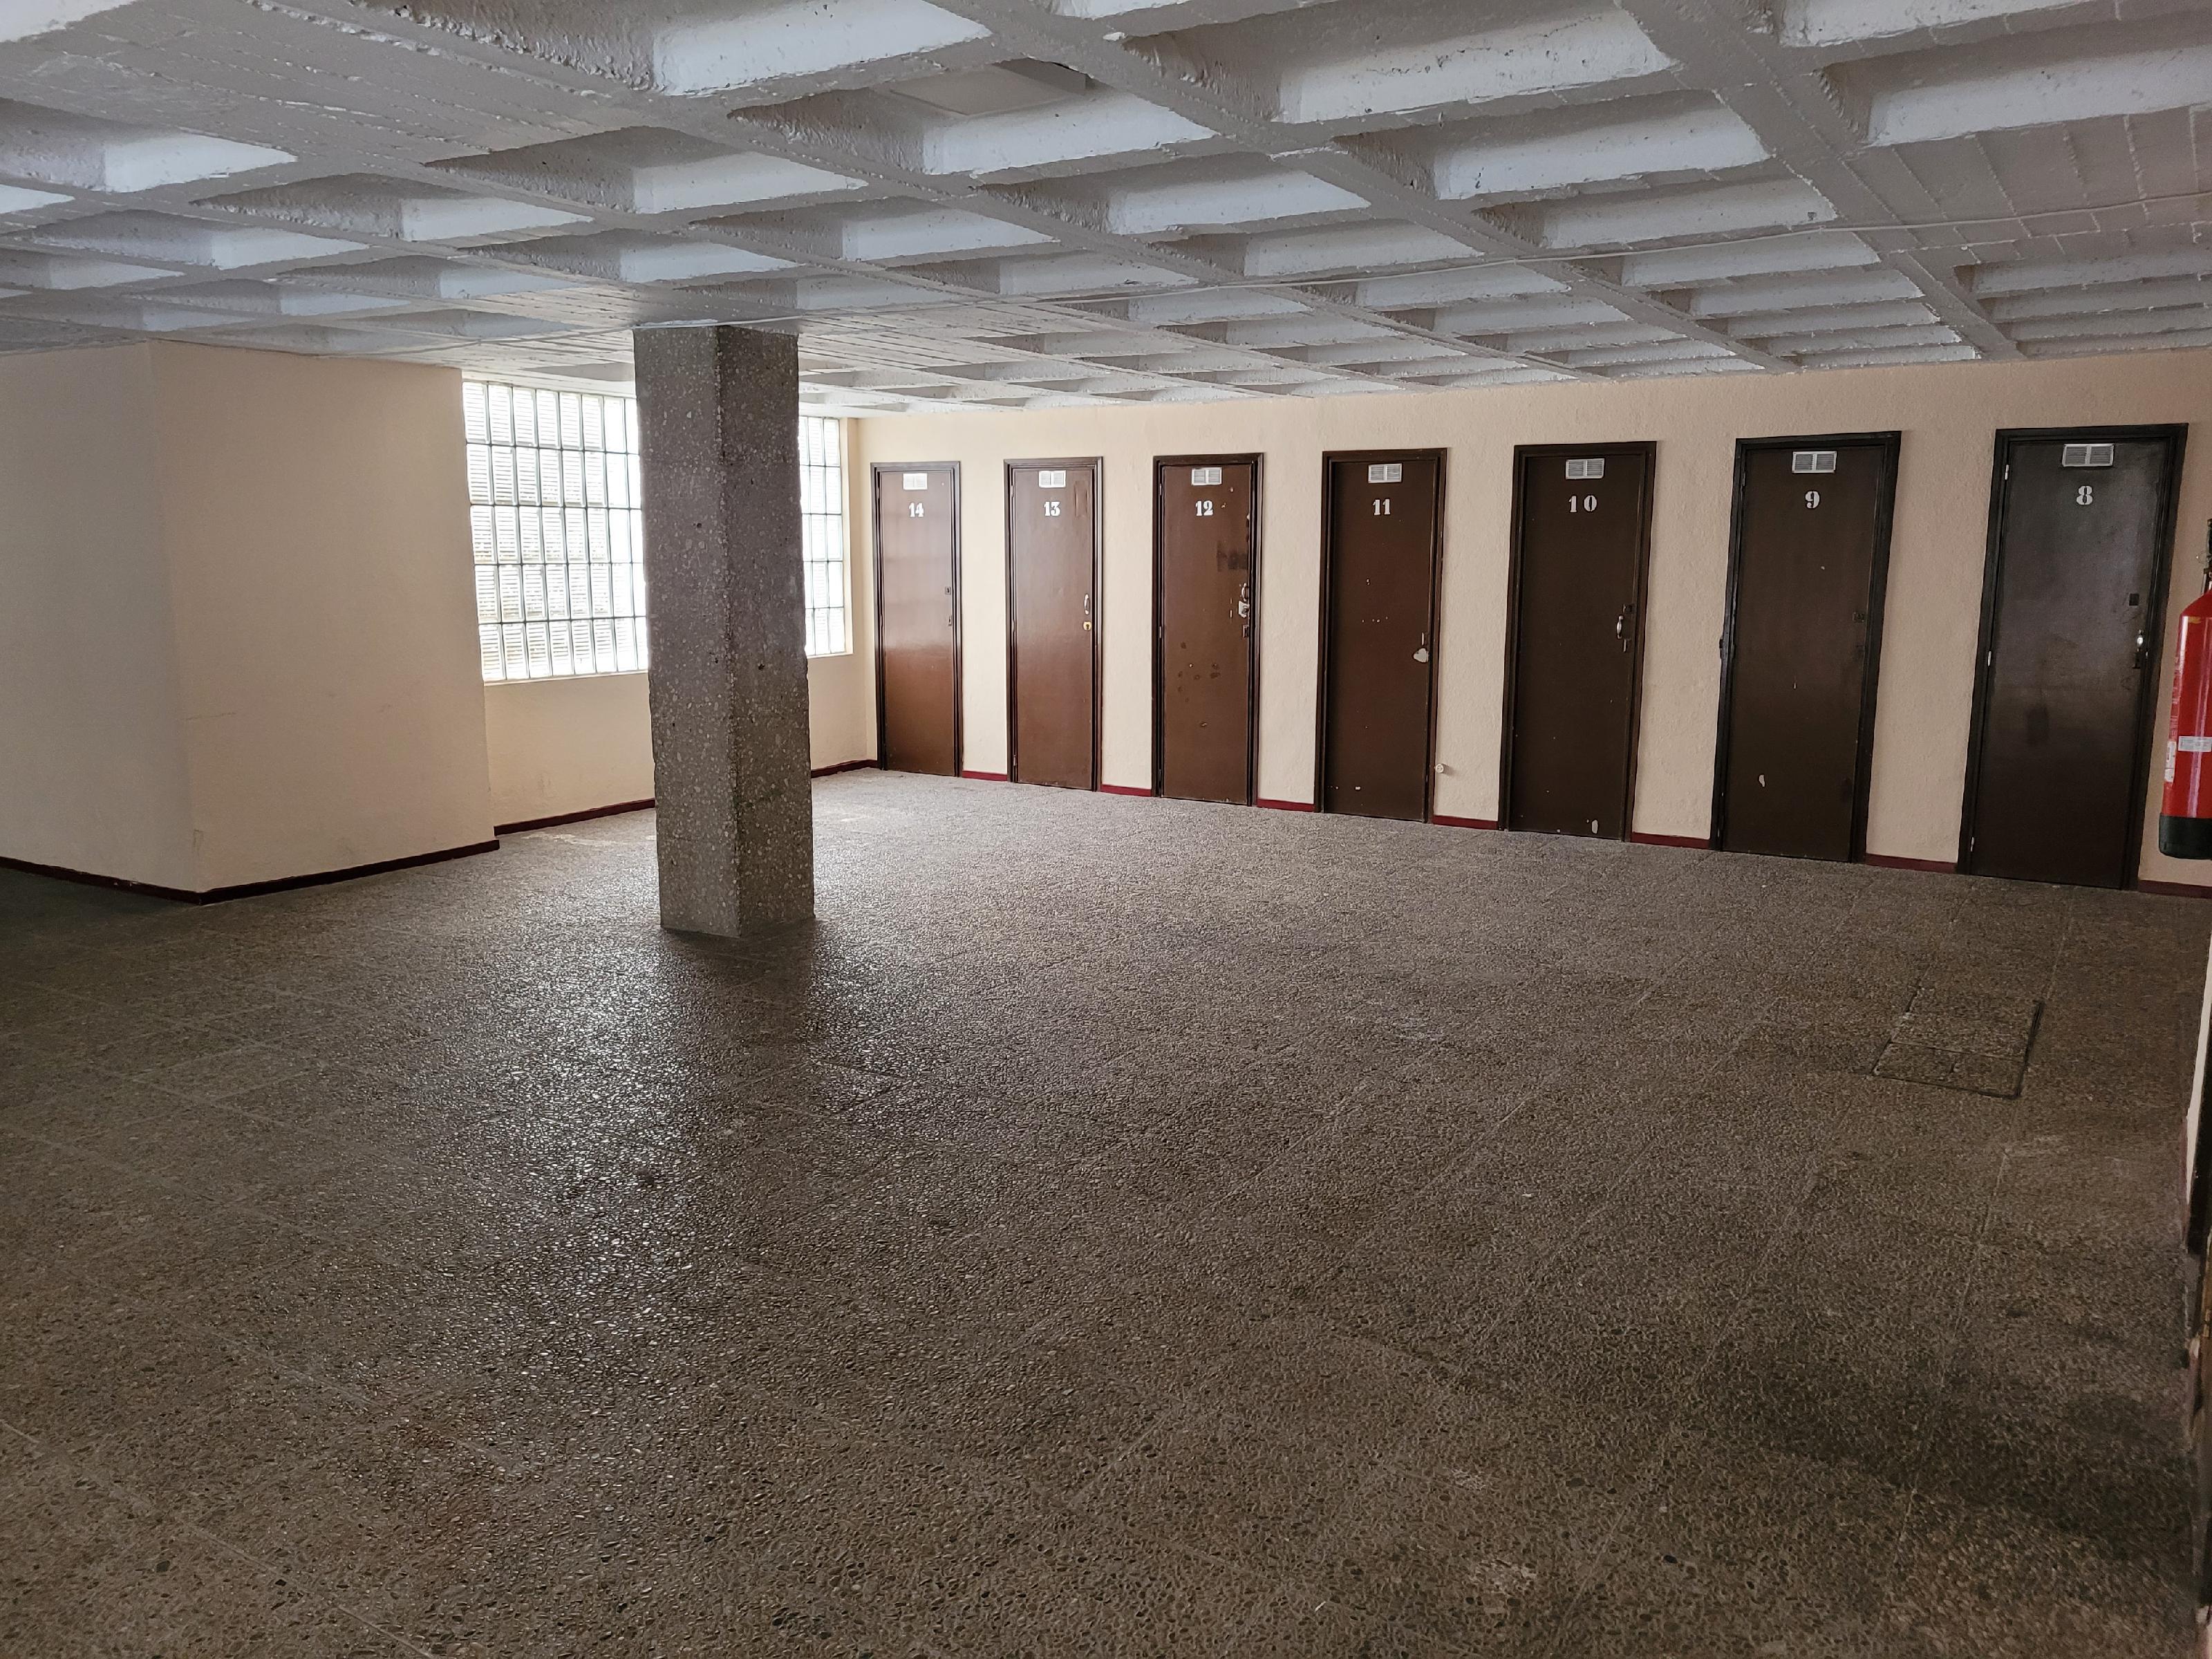 Imagen 4 Apartamento en venta en Alicante/alacant / Zona  centro mercado